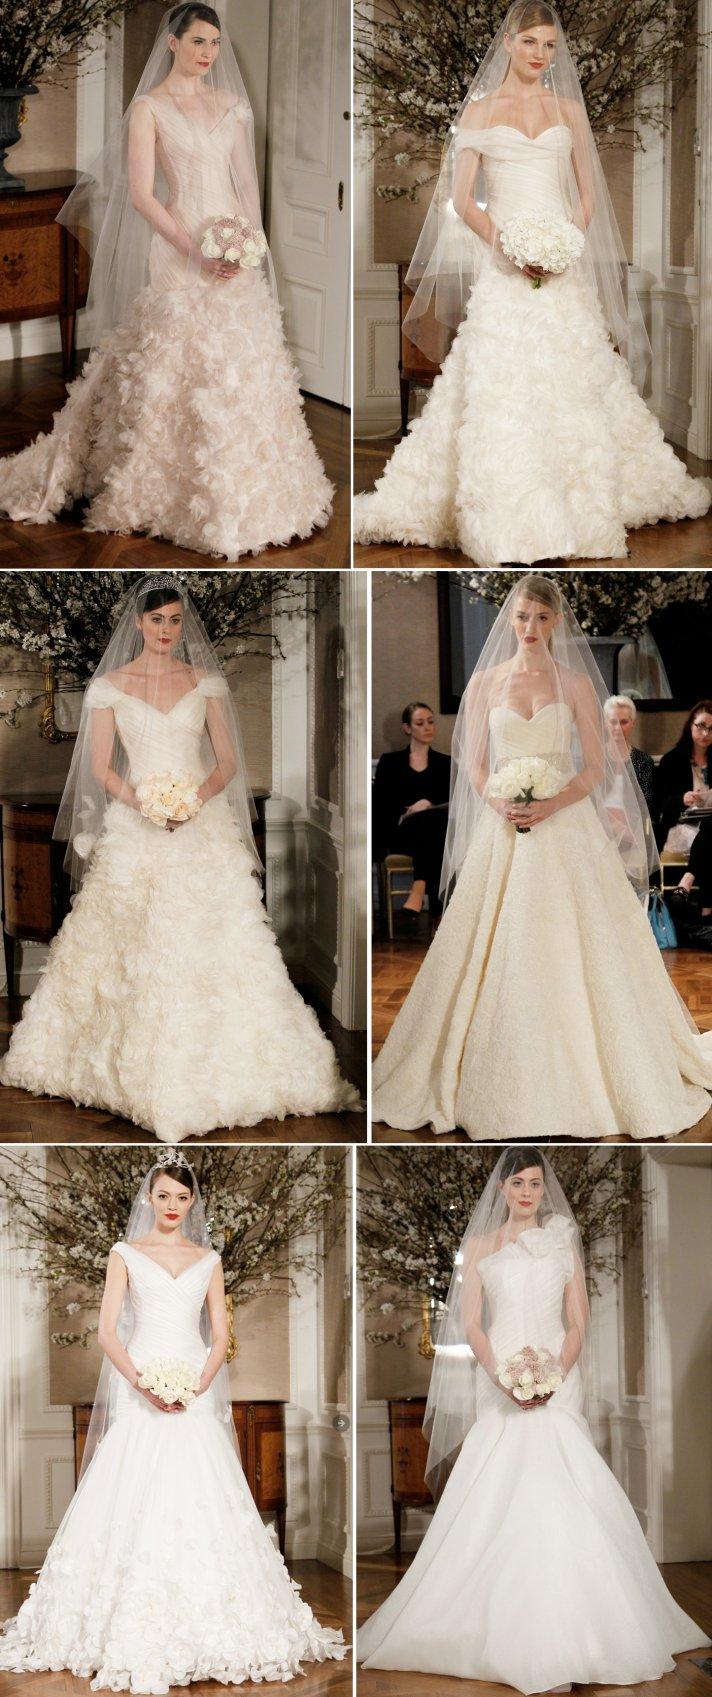 romona keveza wedding dresses spring 2012 bridal gowns